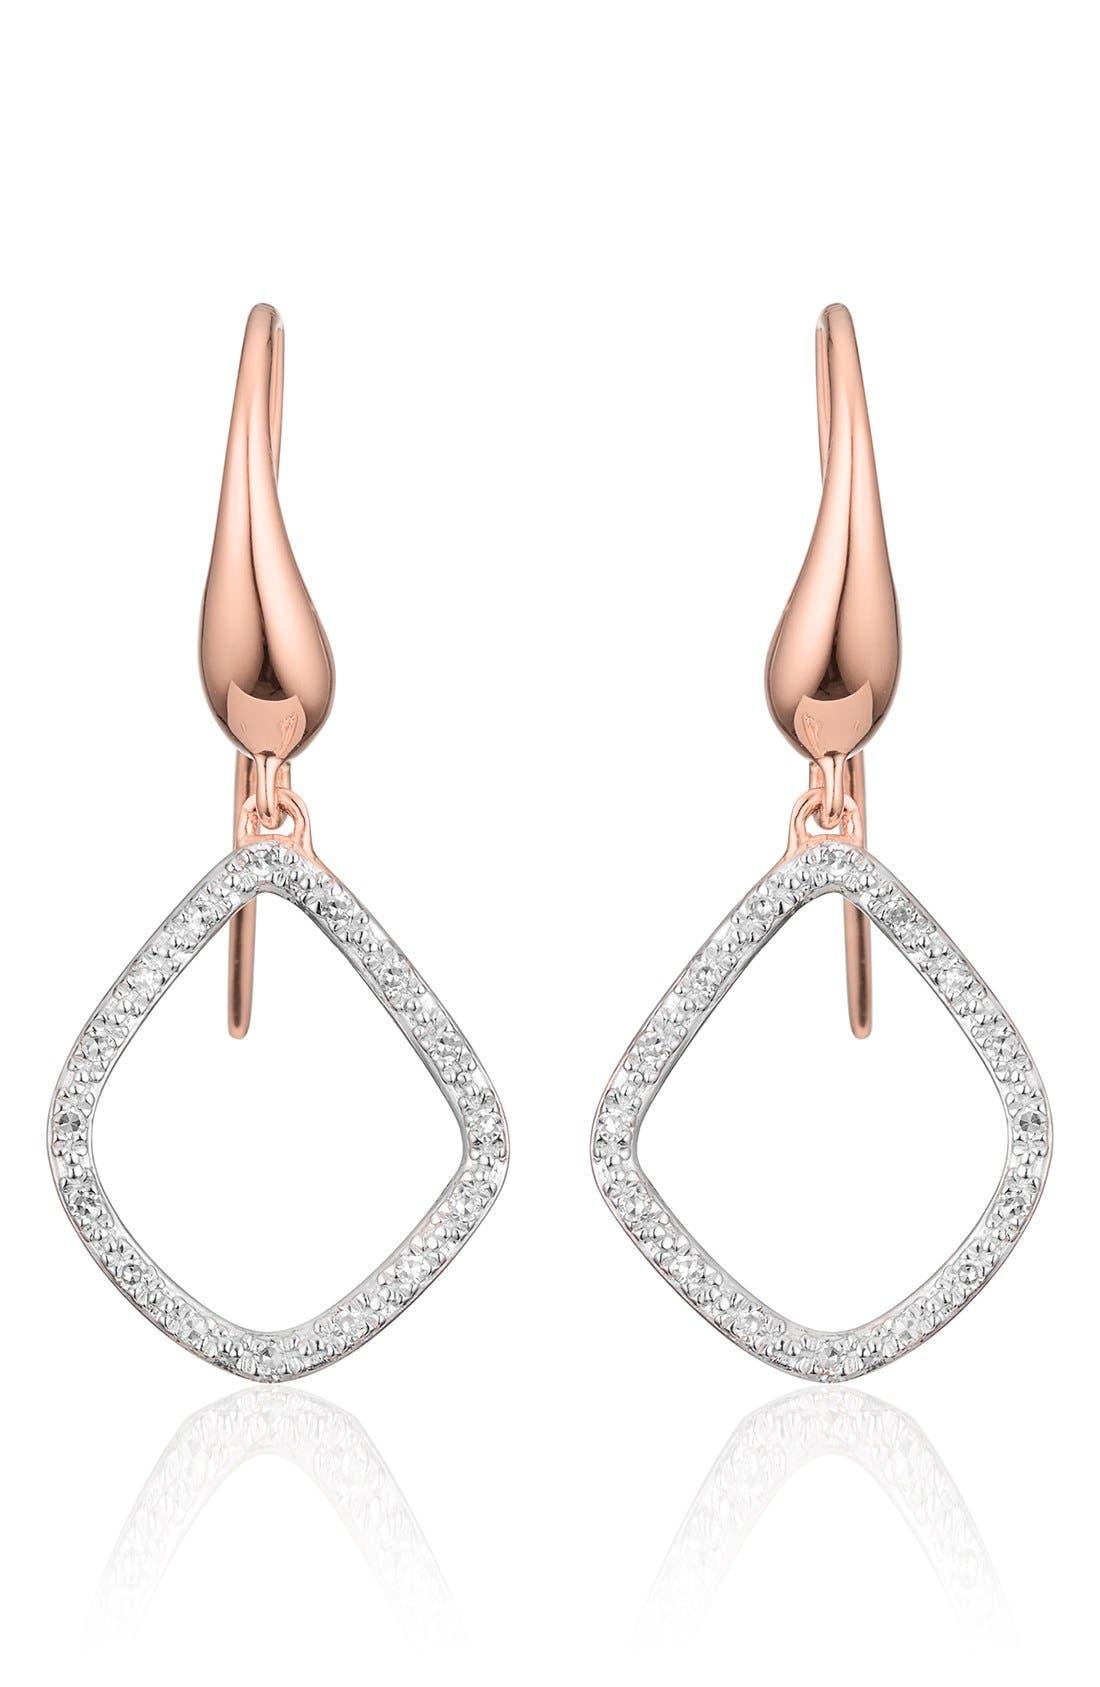 MONICA VINADER Riva Kite Diamond Drop Earrings